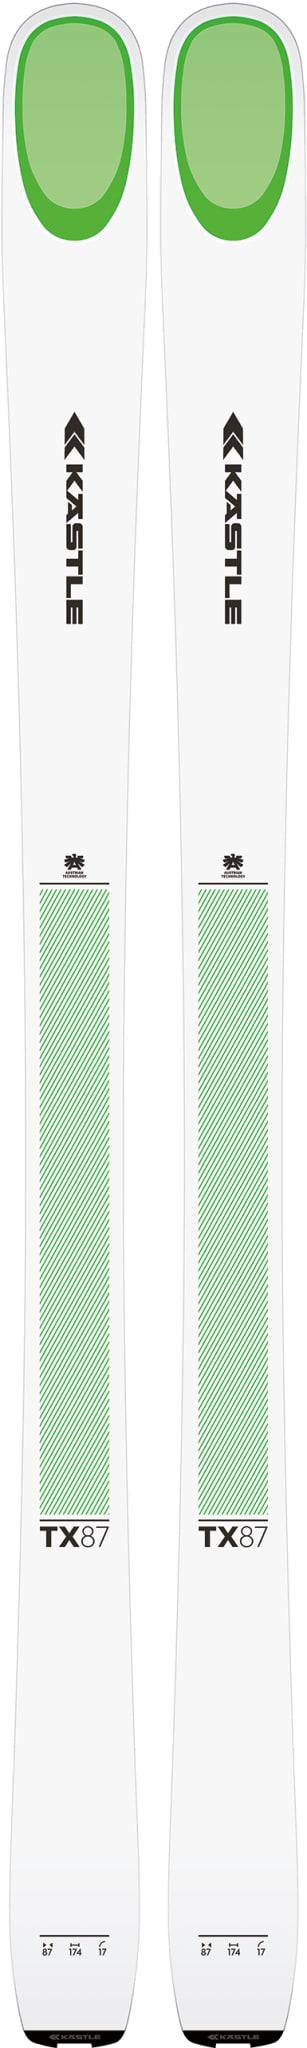 TX87 & Titan Varion 2